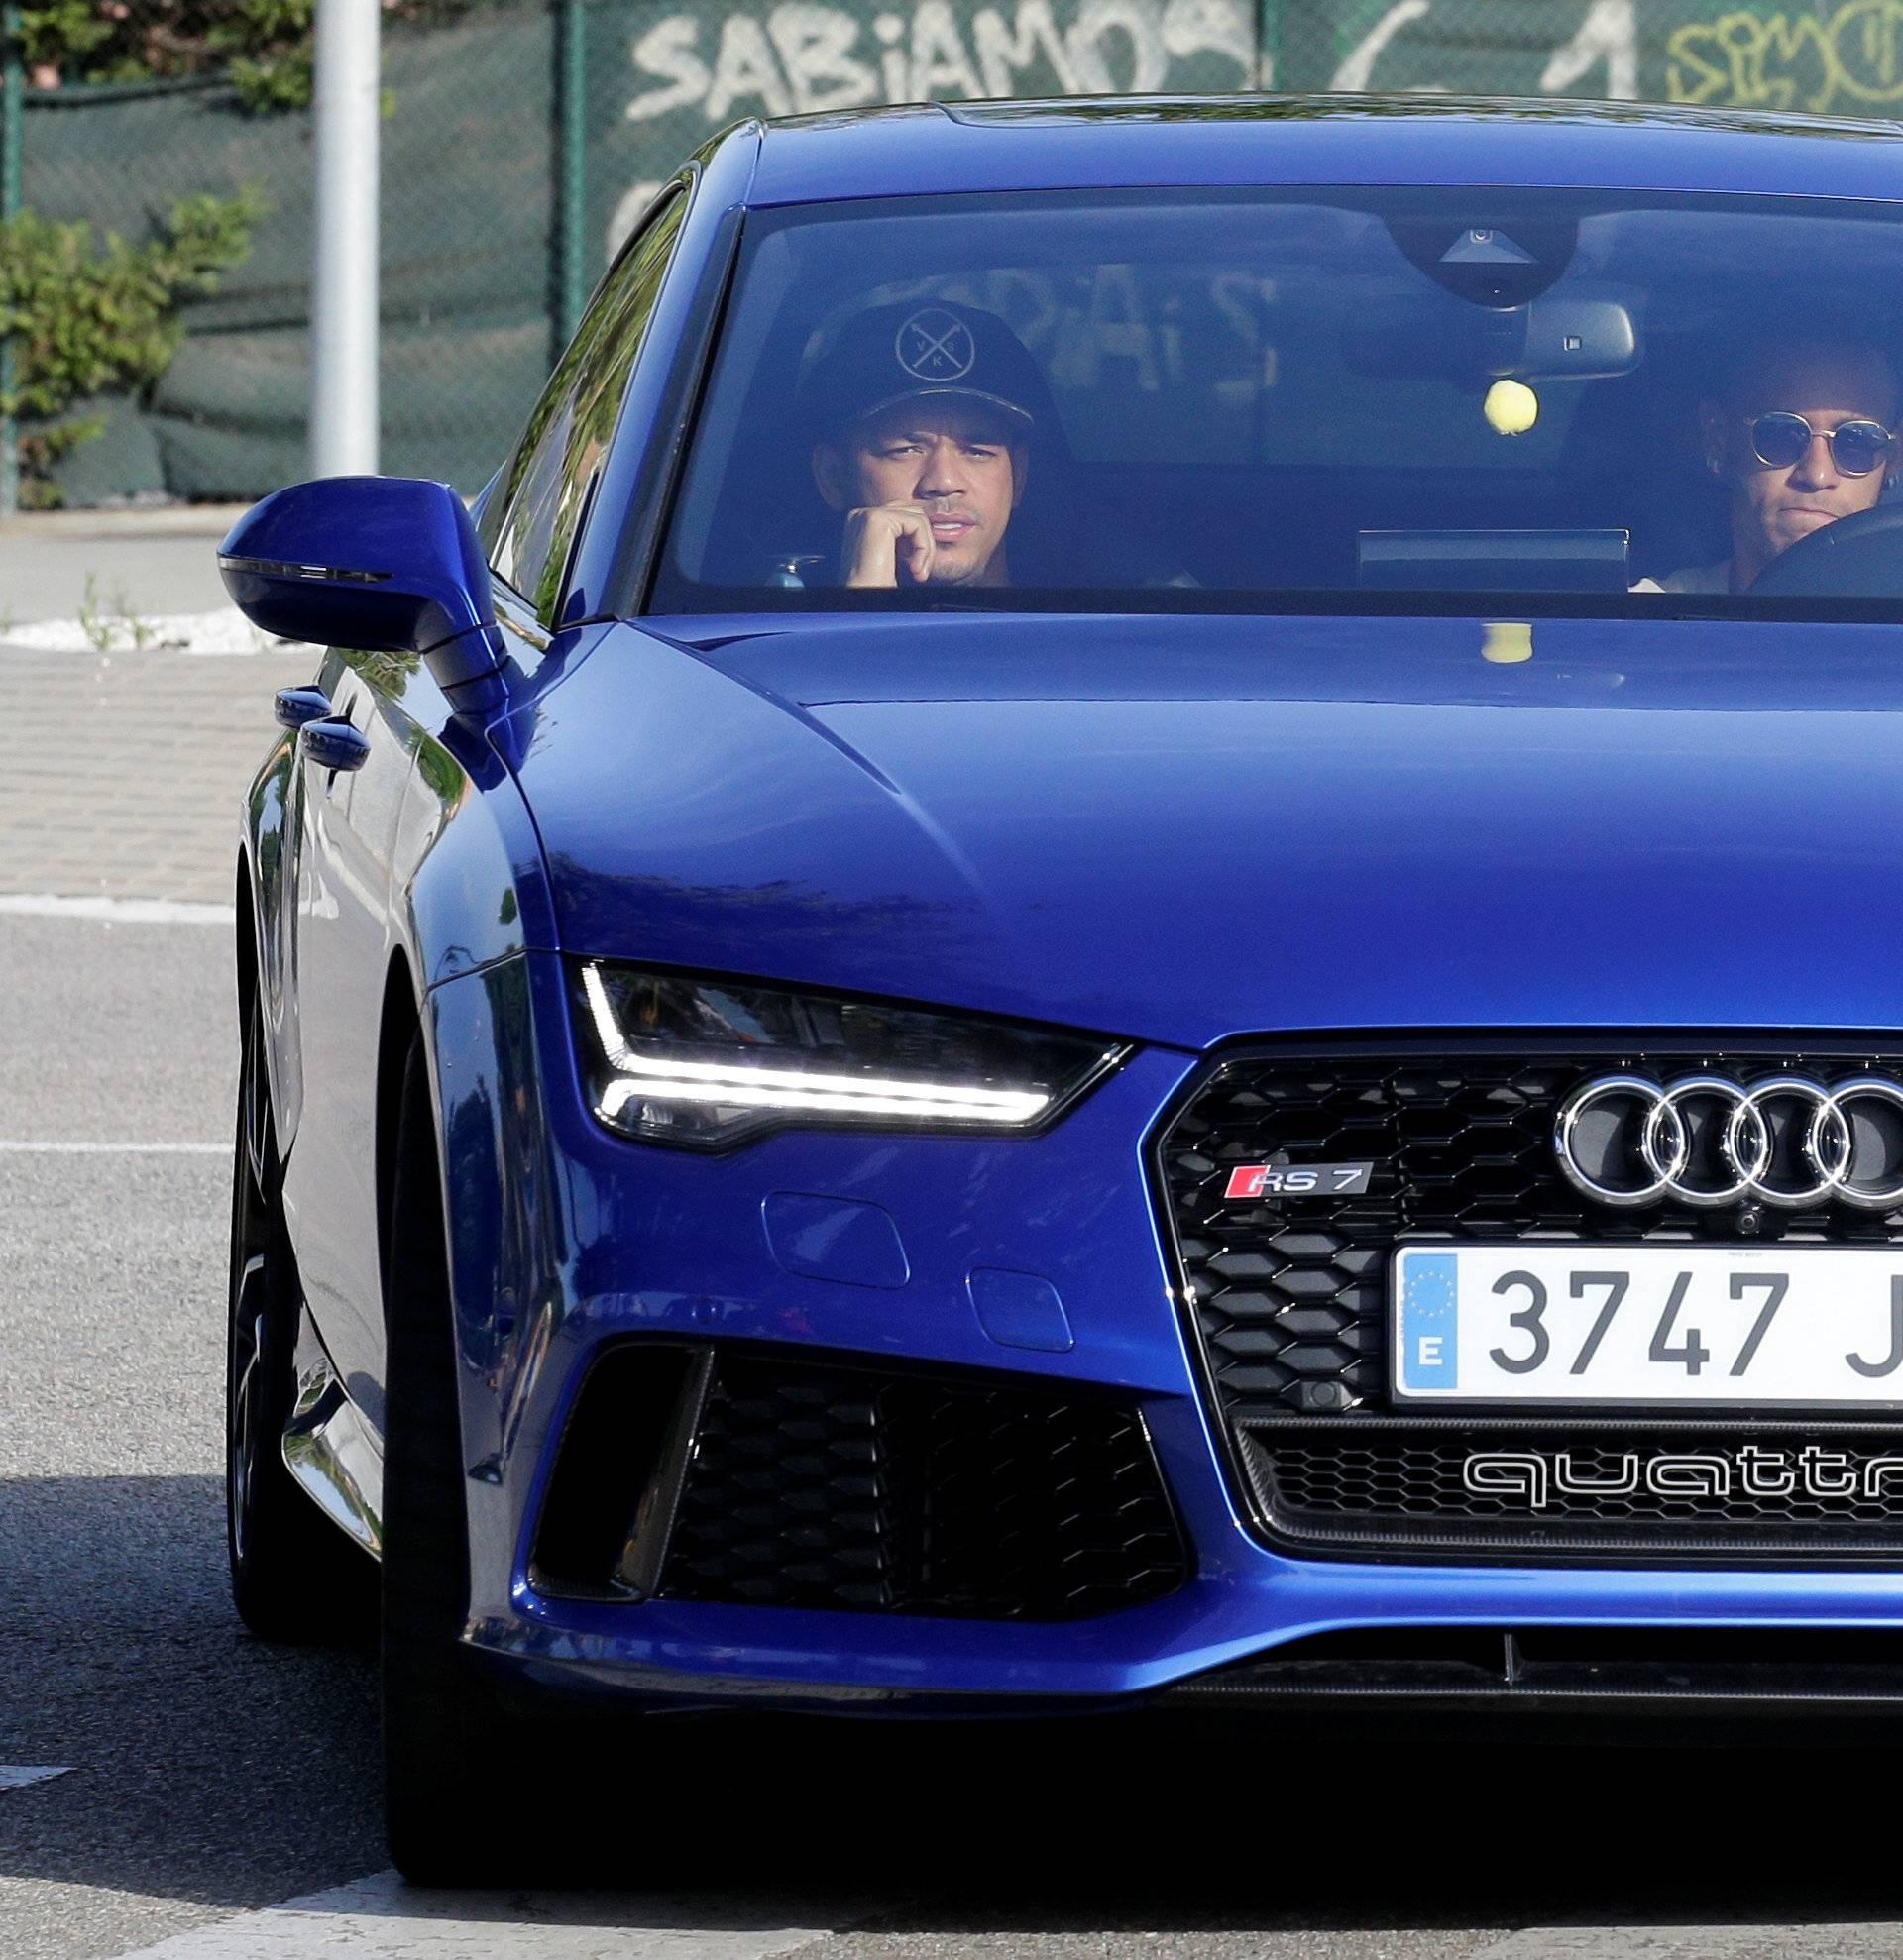 Brazilian soccer player Neymar drives to arrive to Joan Gamper training camp near Barcelona